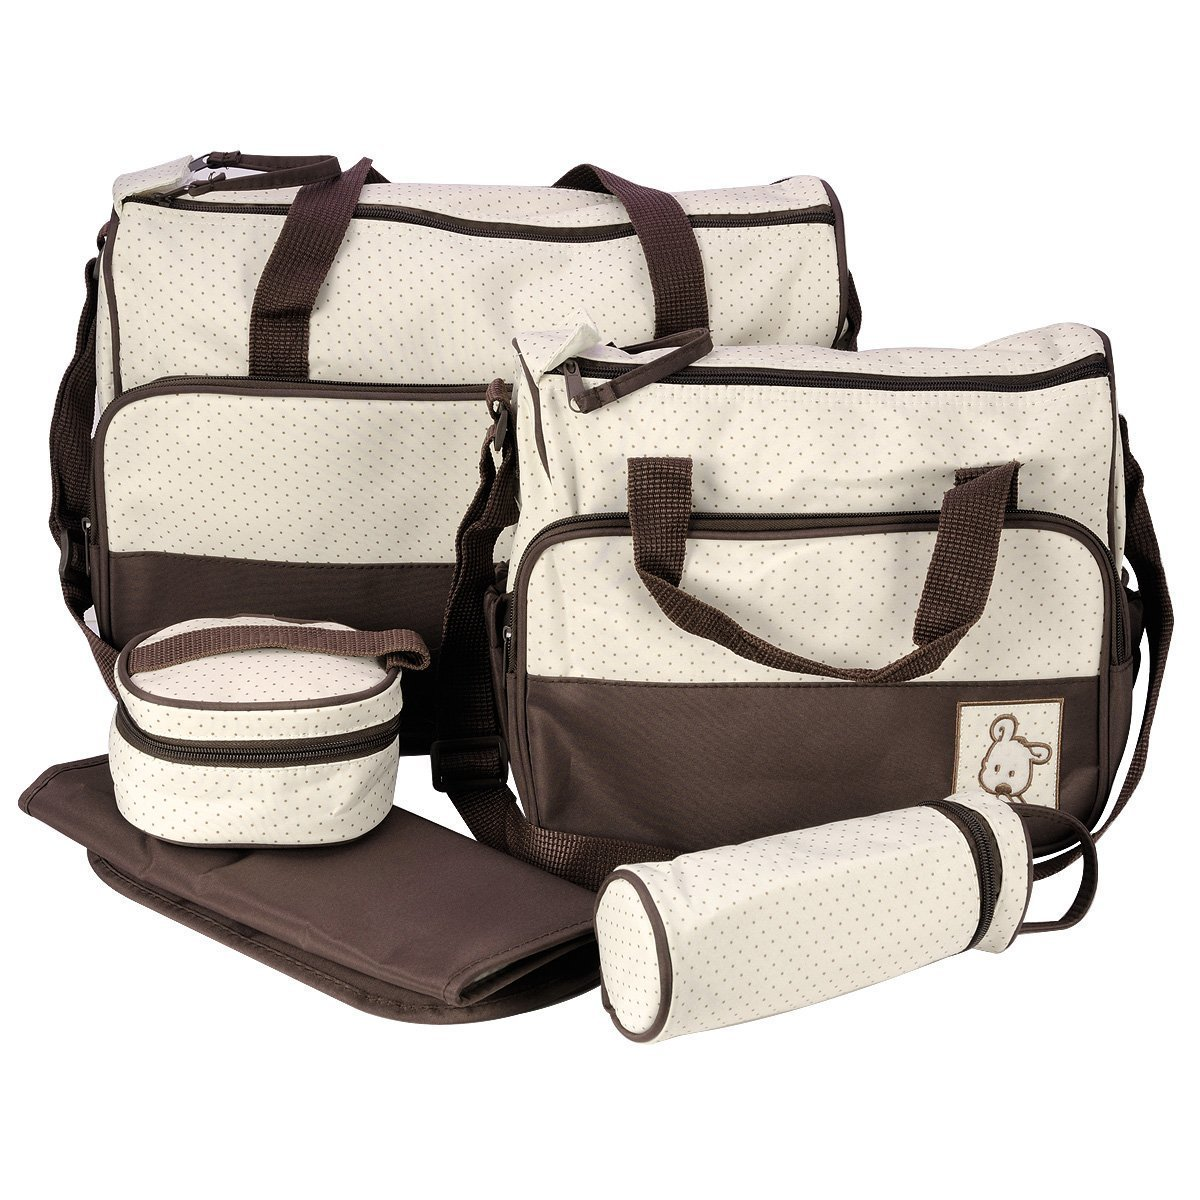 Set 5 kits Bolsa de Mama Para Bebe